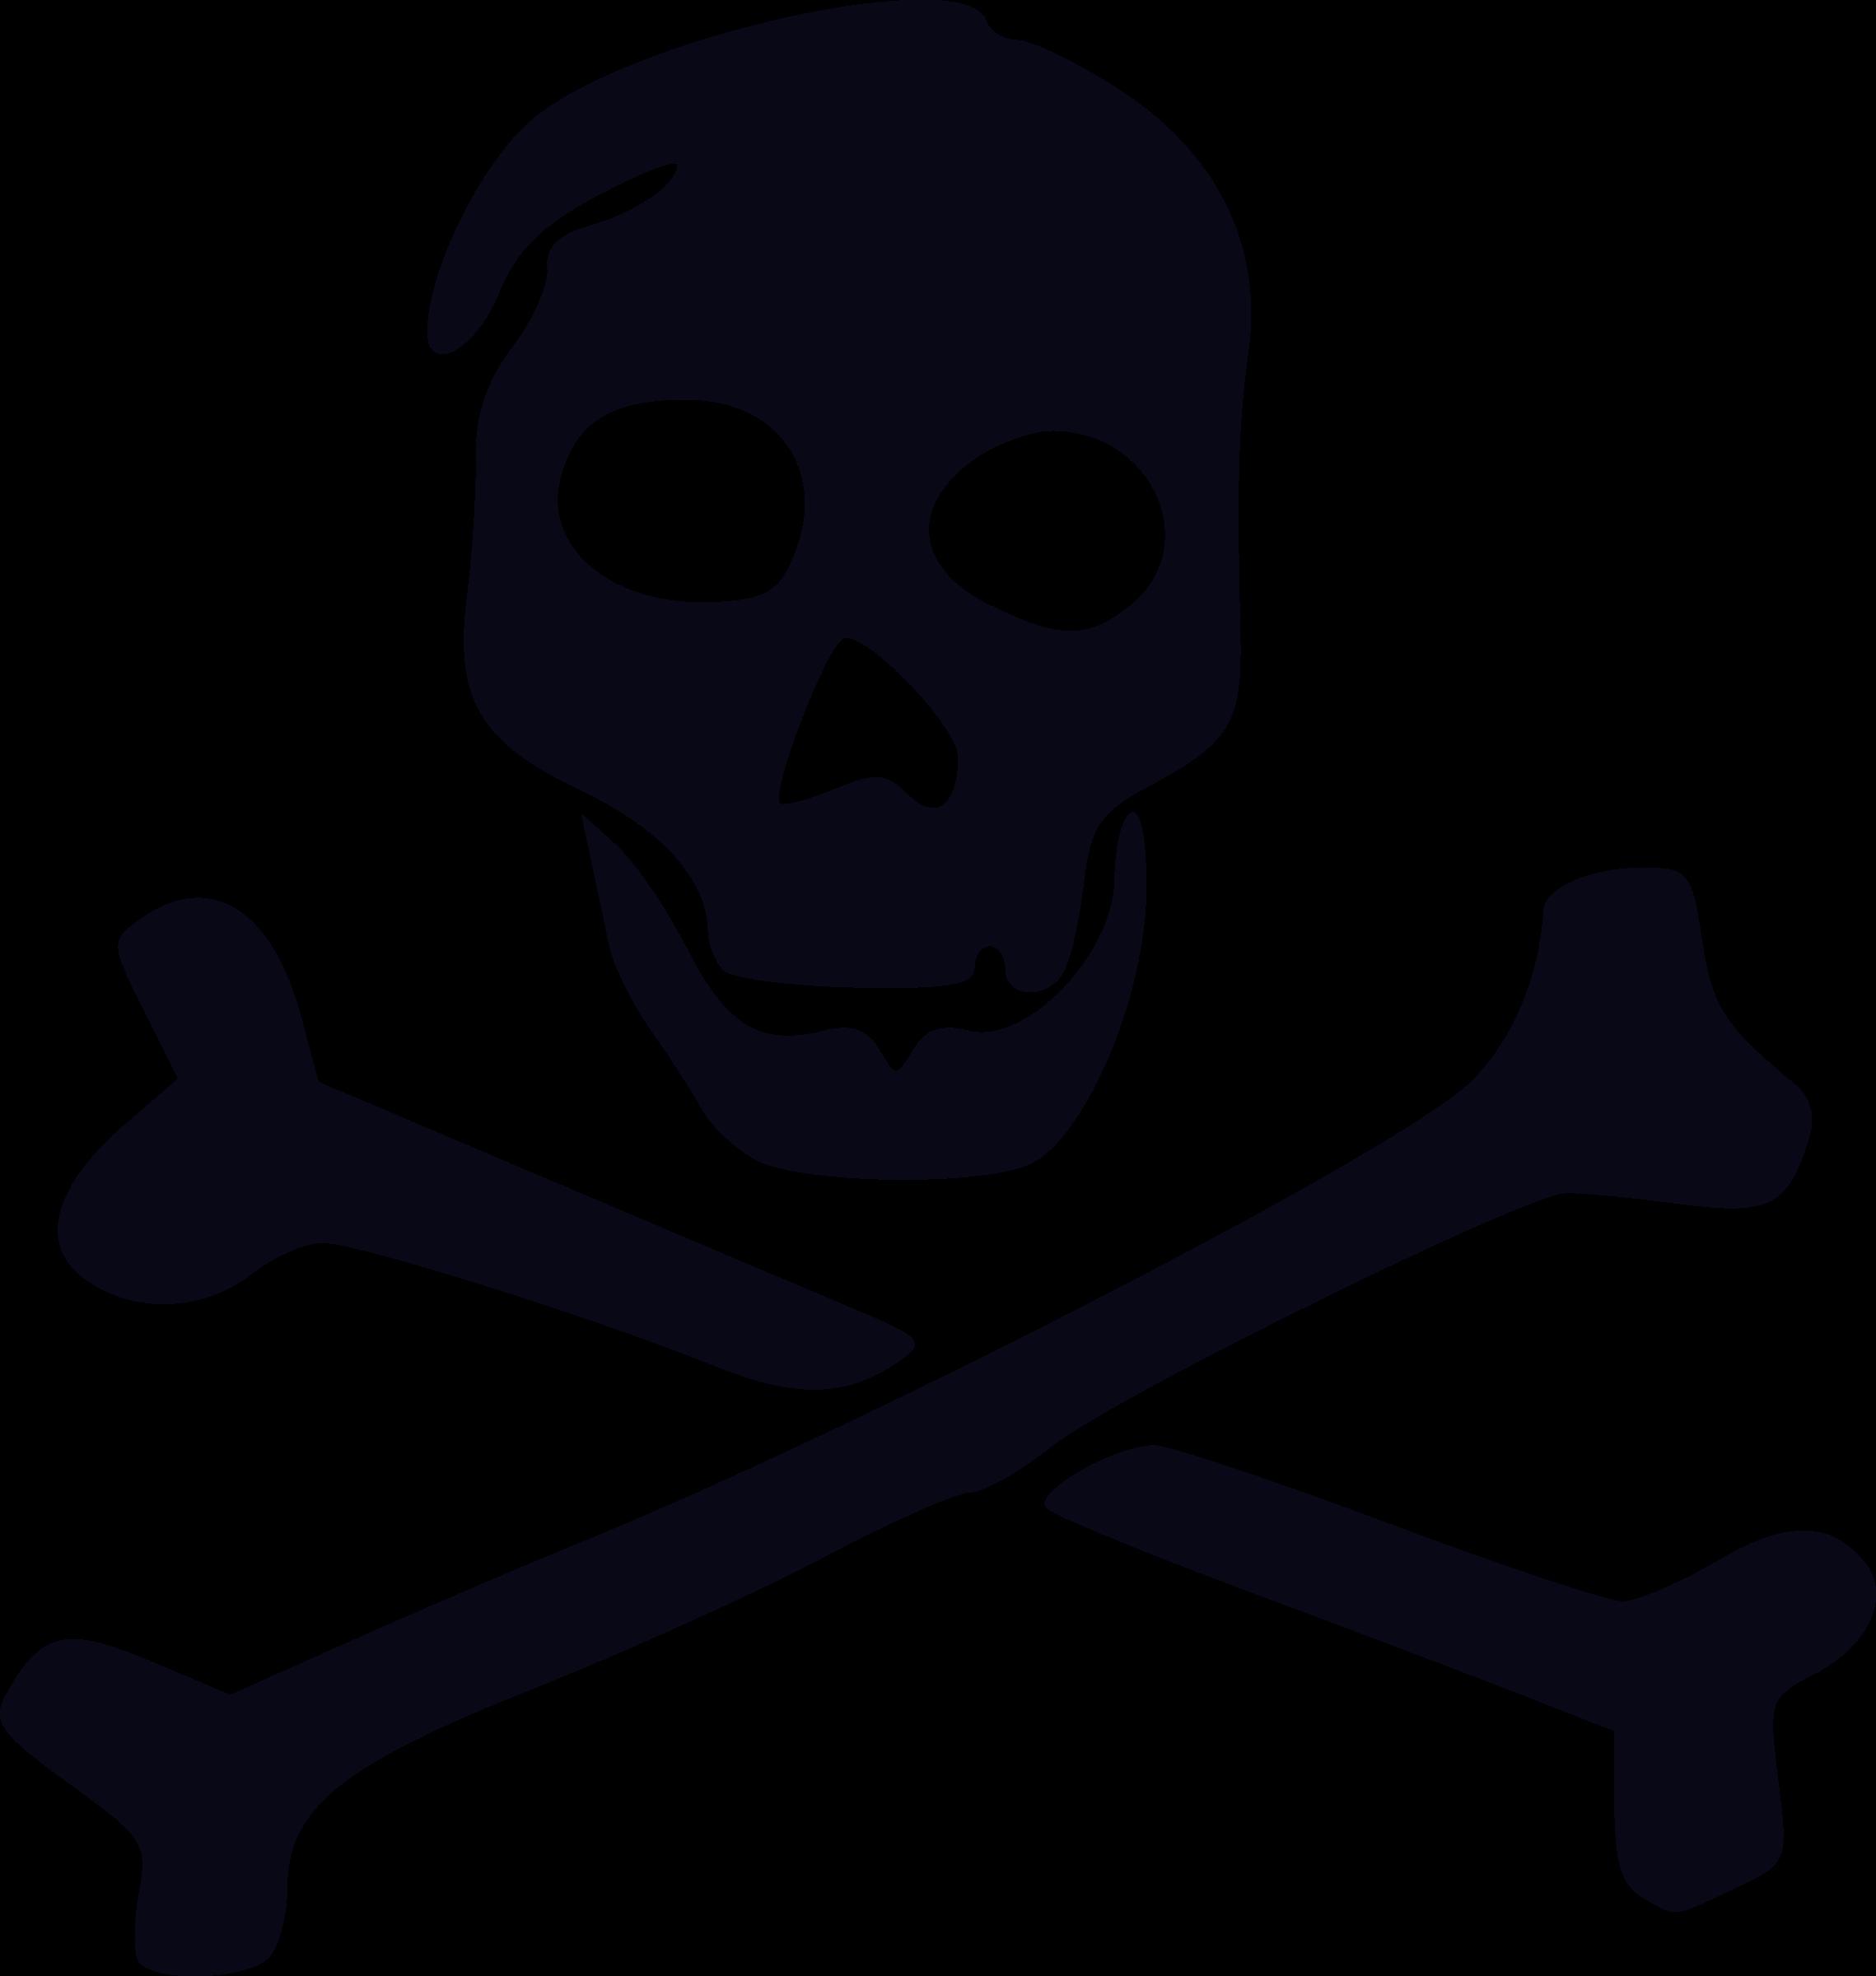 Clipart Skull And Bones Sketch